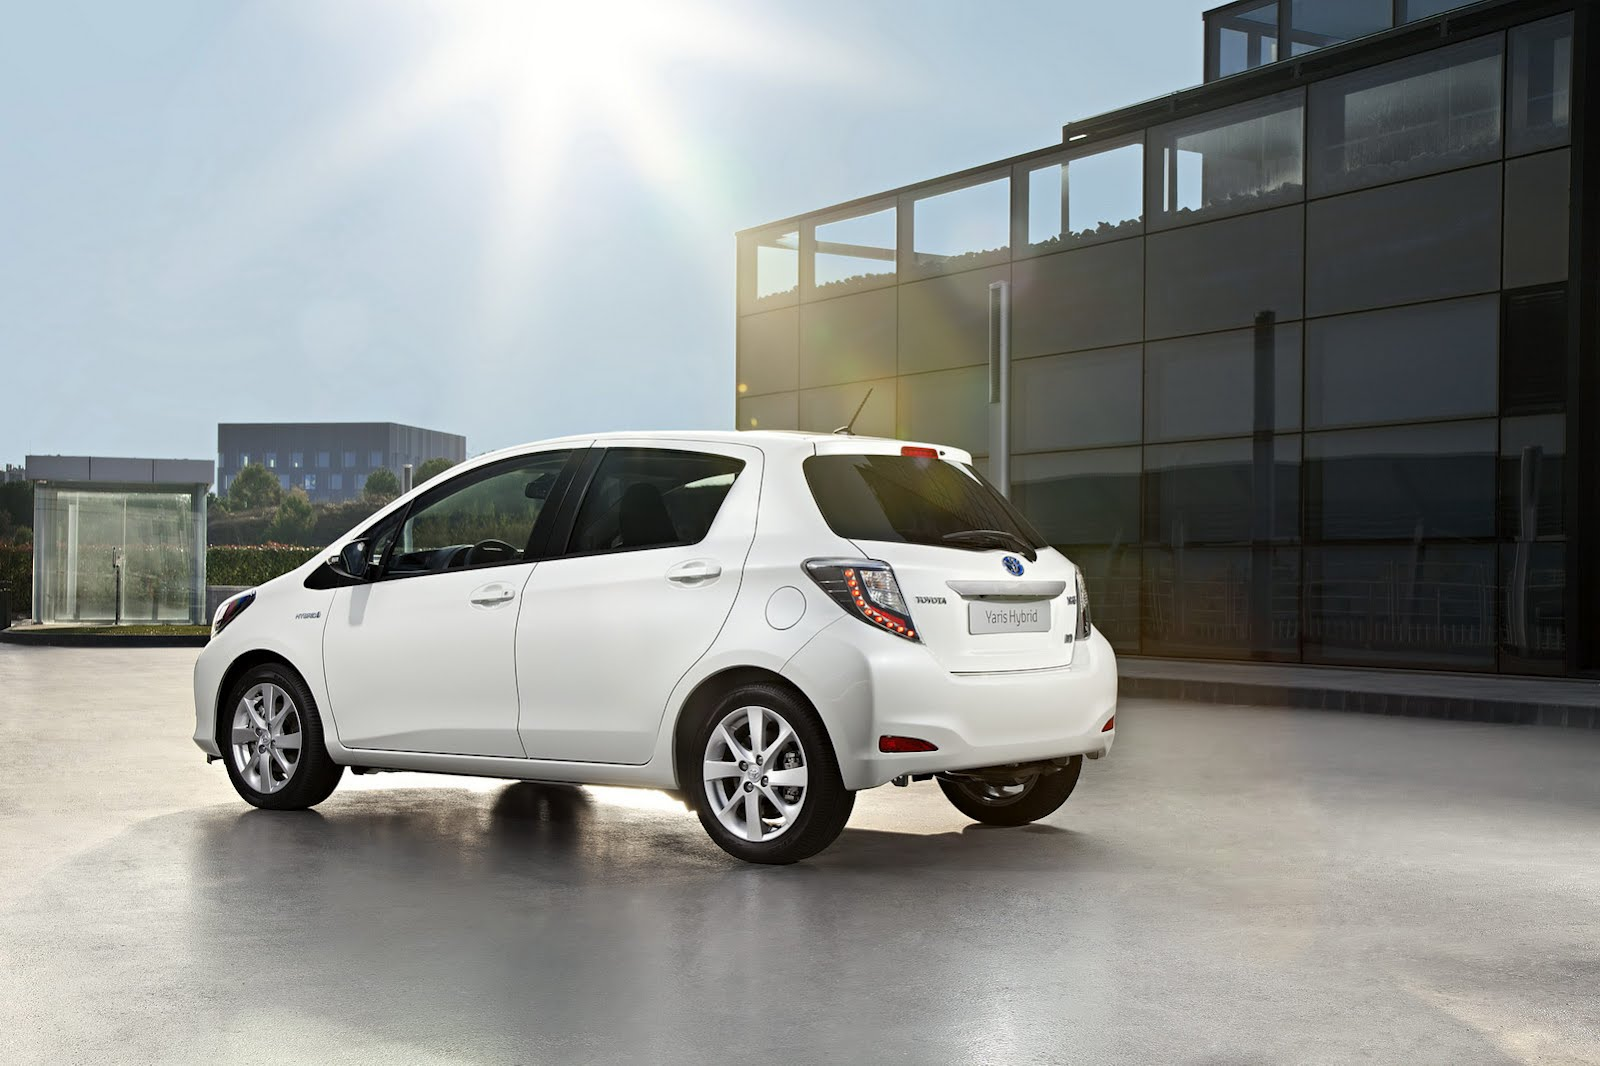 Toyota Yaris Hybrid HSD Litri VVT I Da CV E Nm Motore